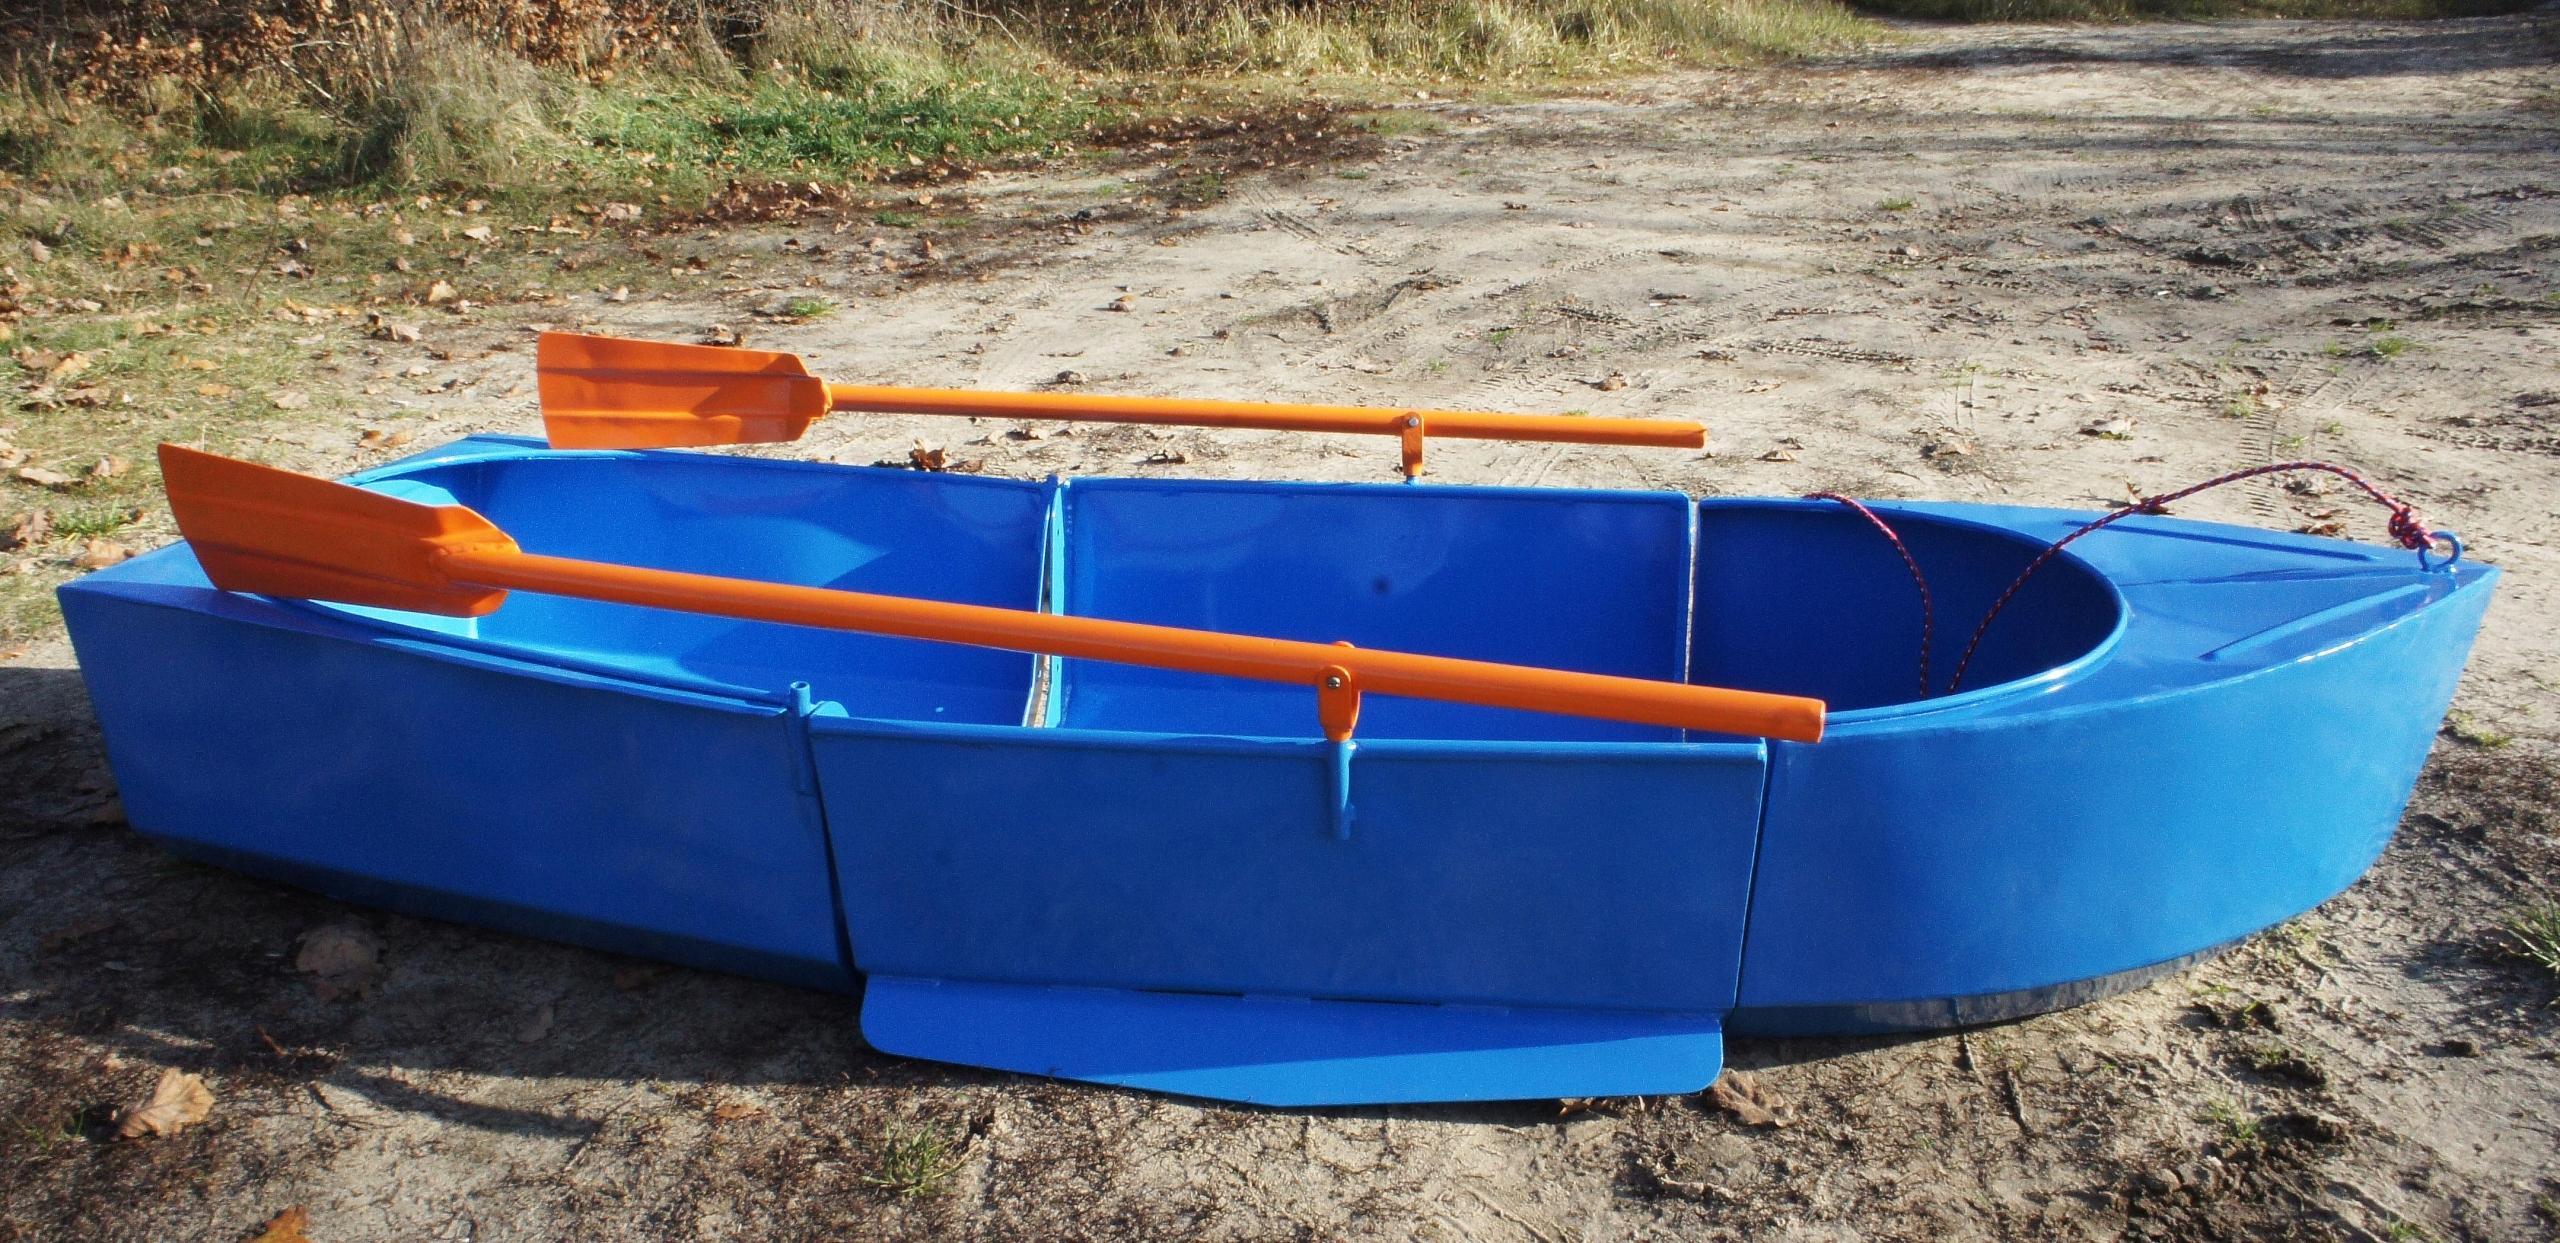 łódka wędkarska składana aluminiowa